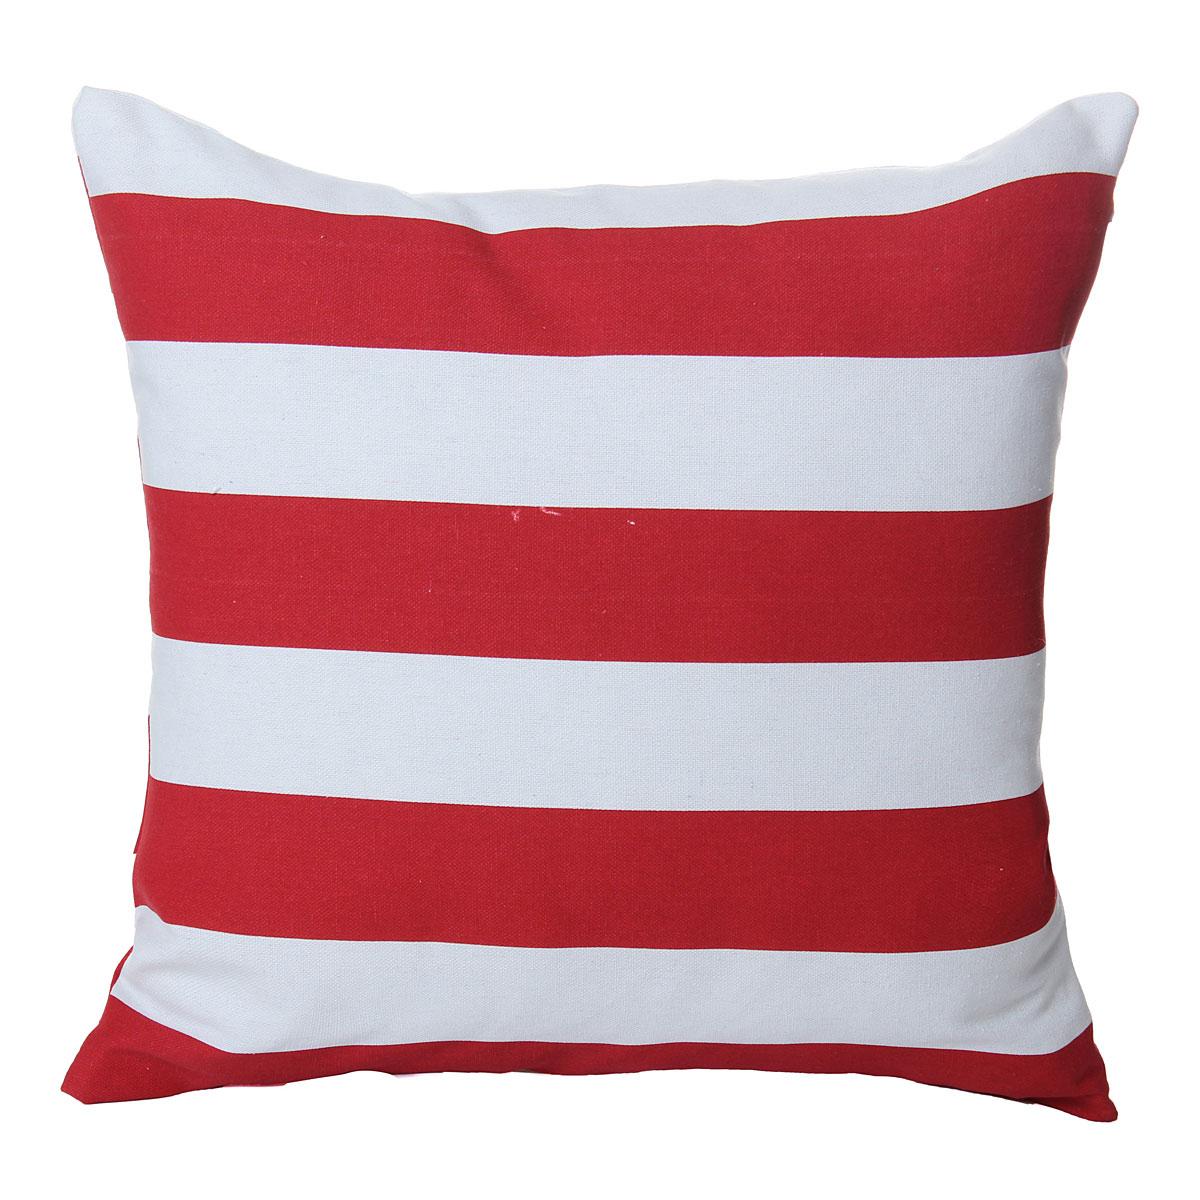 Geometric-Stripe-Wave-Zig-Zag-Pillow-Case-Cushion-Cover-Linen-Cotton-Home-Decor thumbnail 22